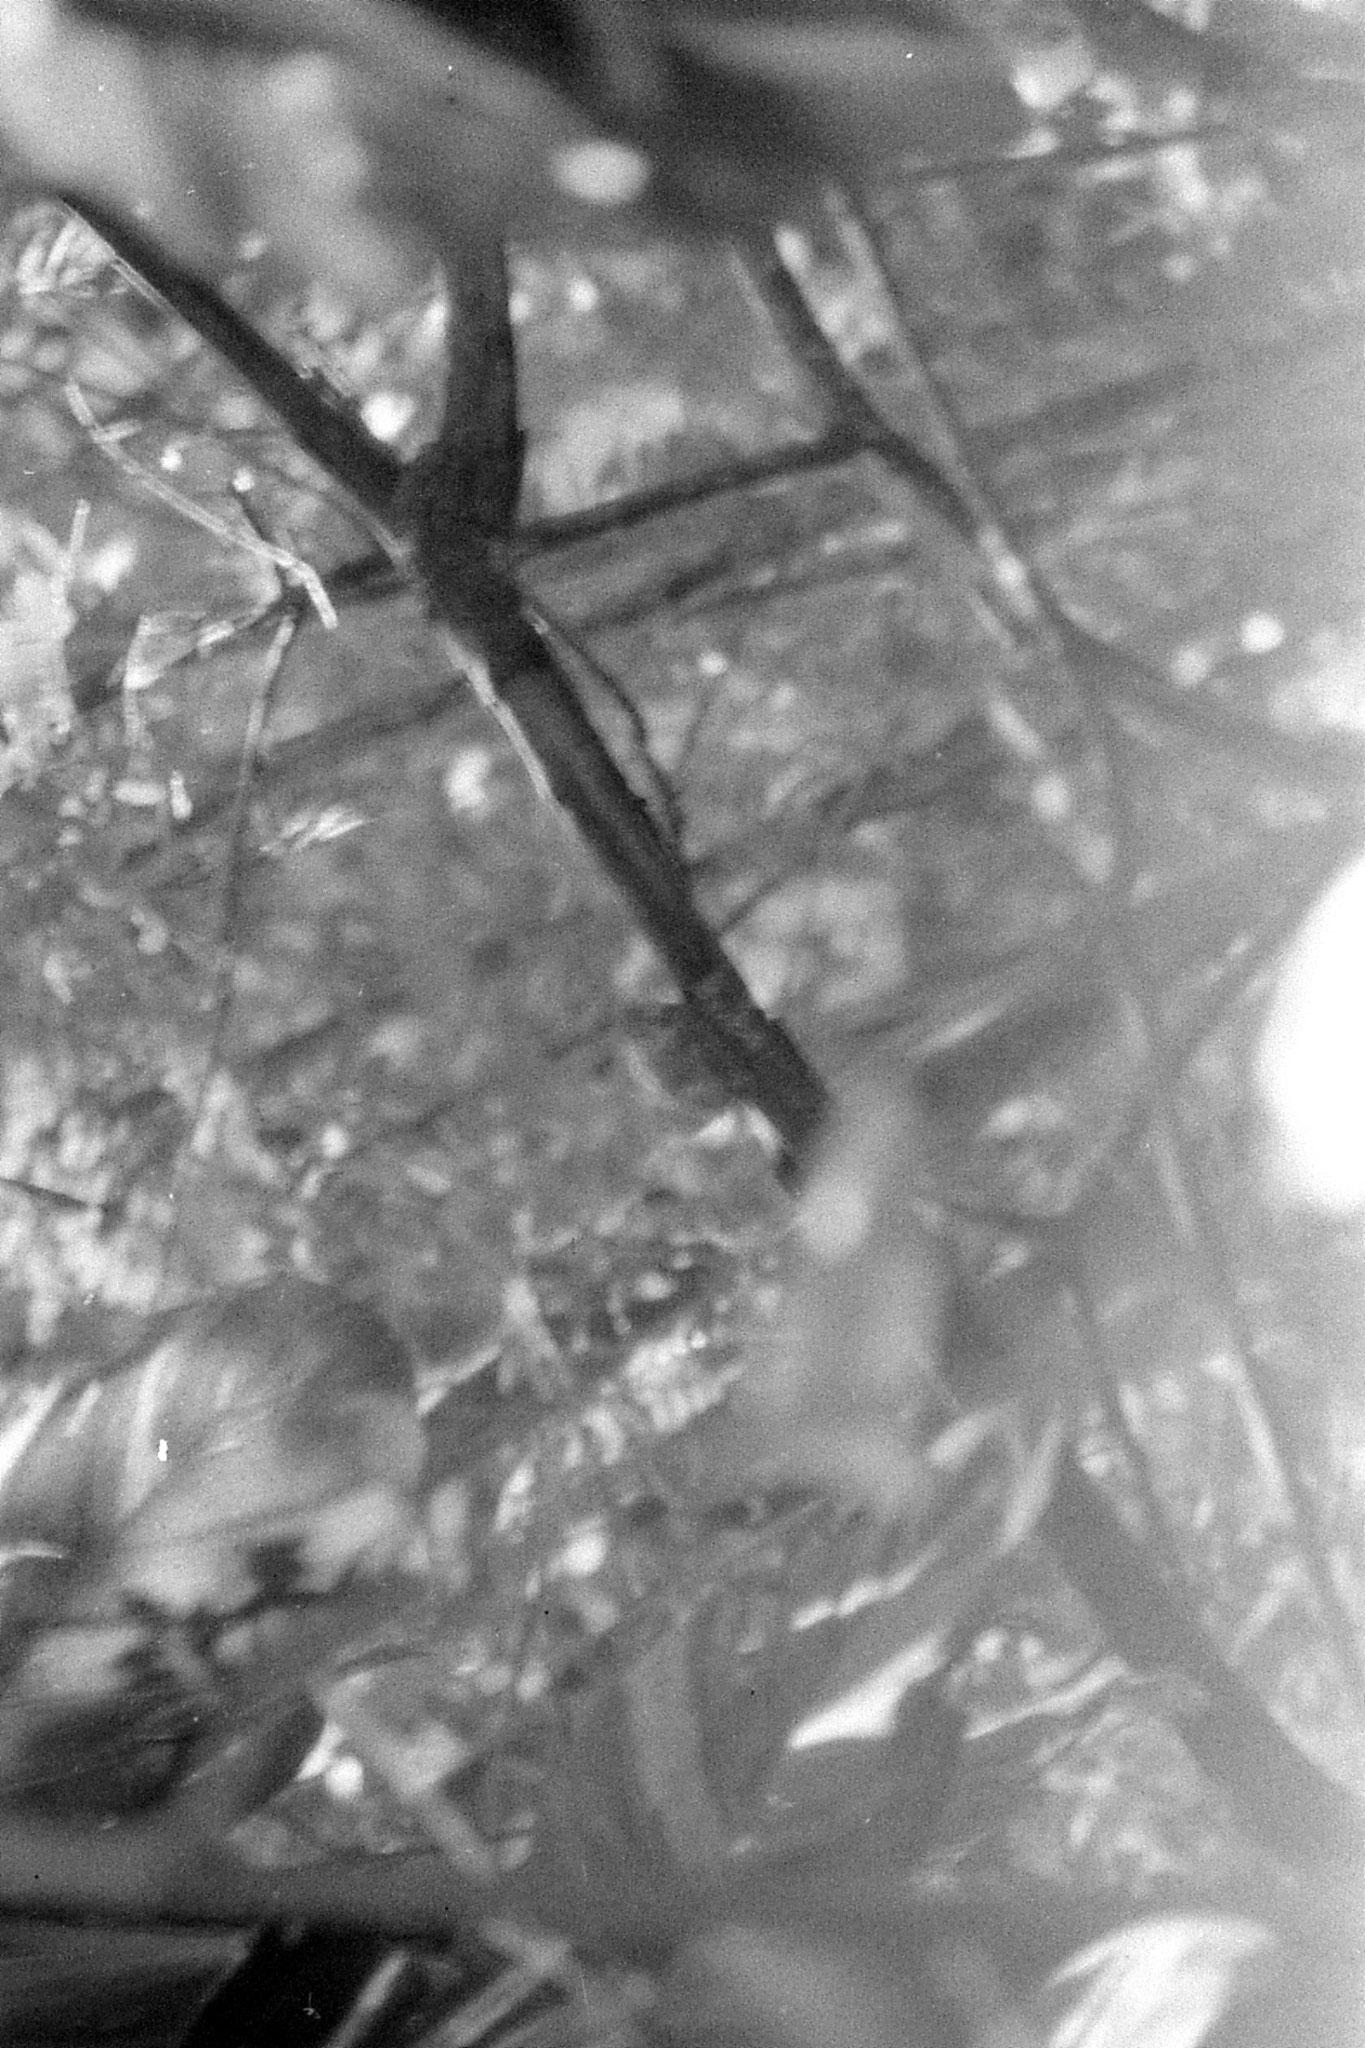 10/1/90: 12: Bangalore palm squirrel in tree